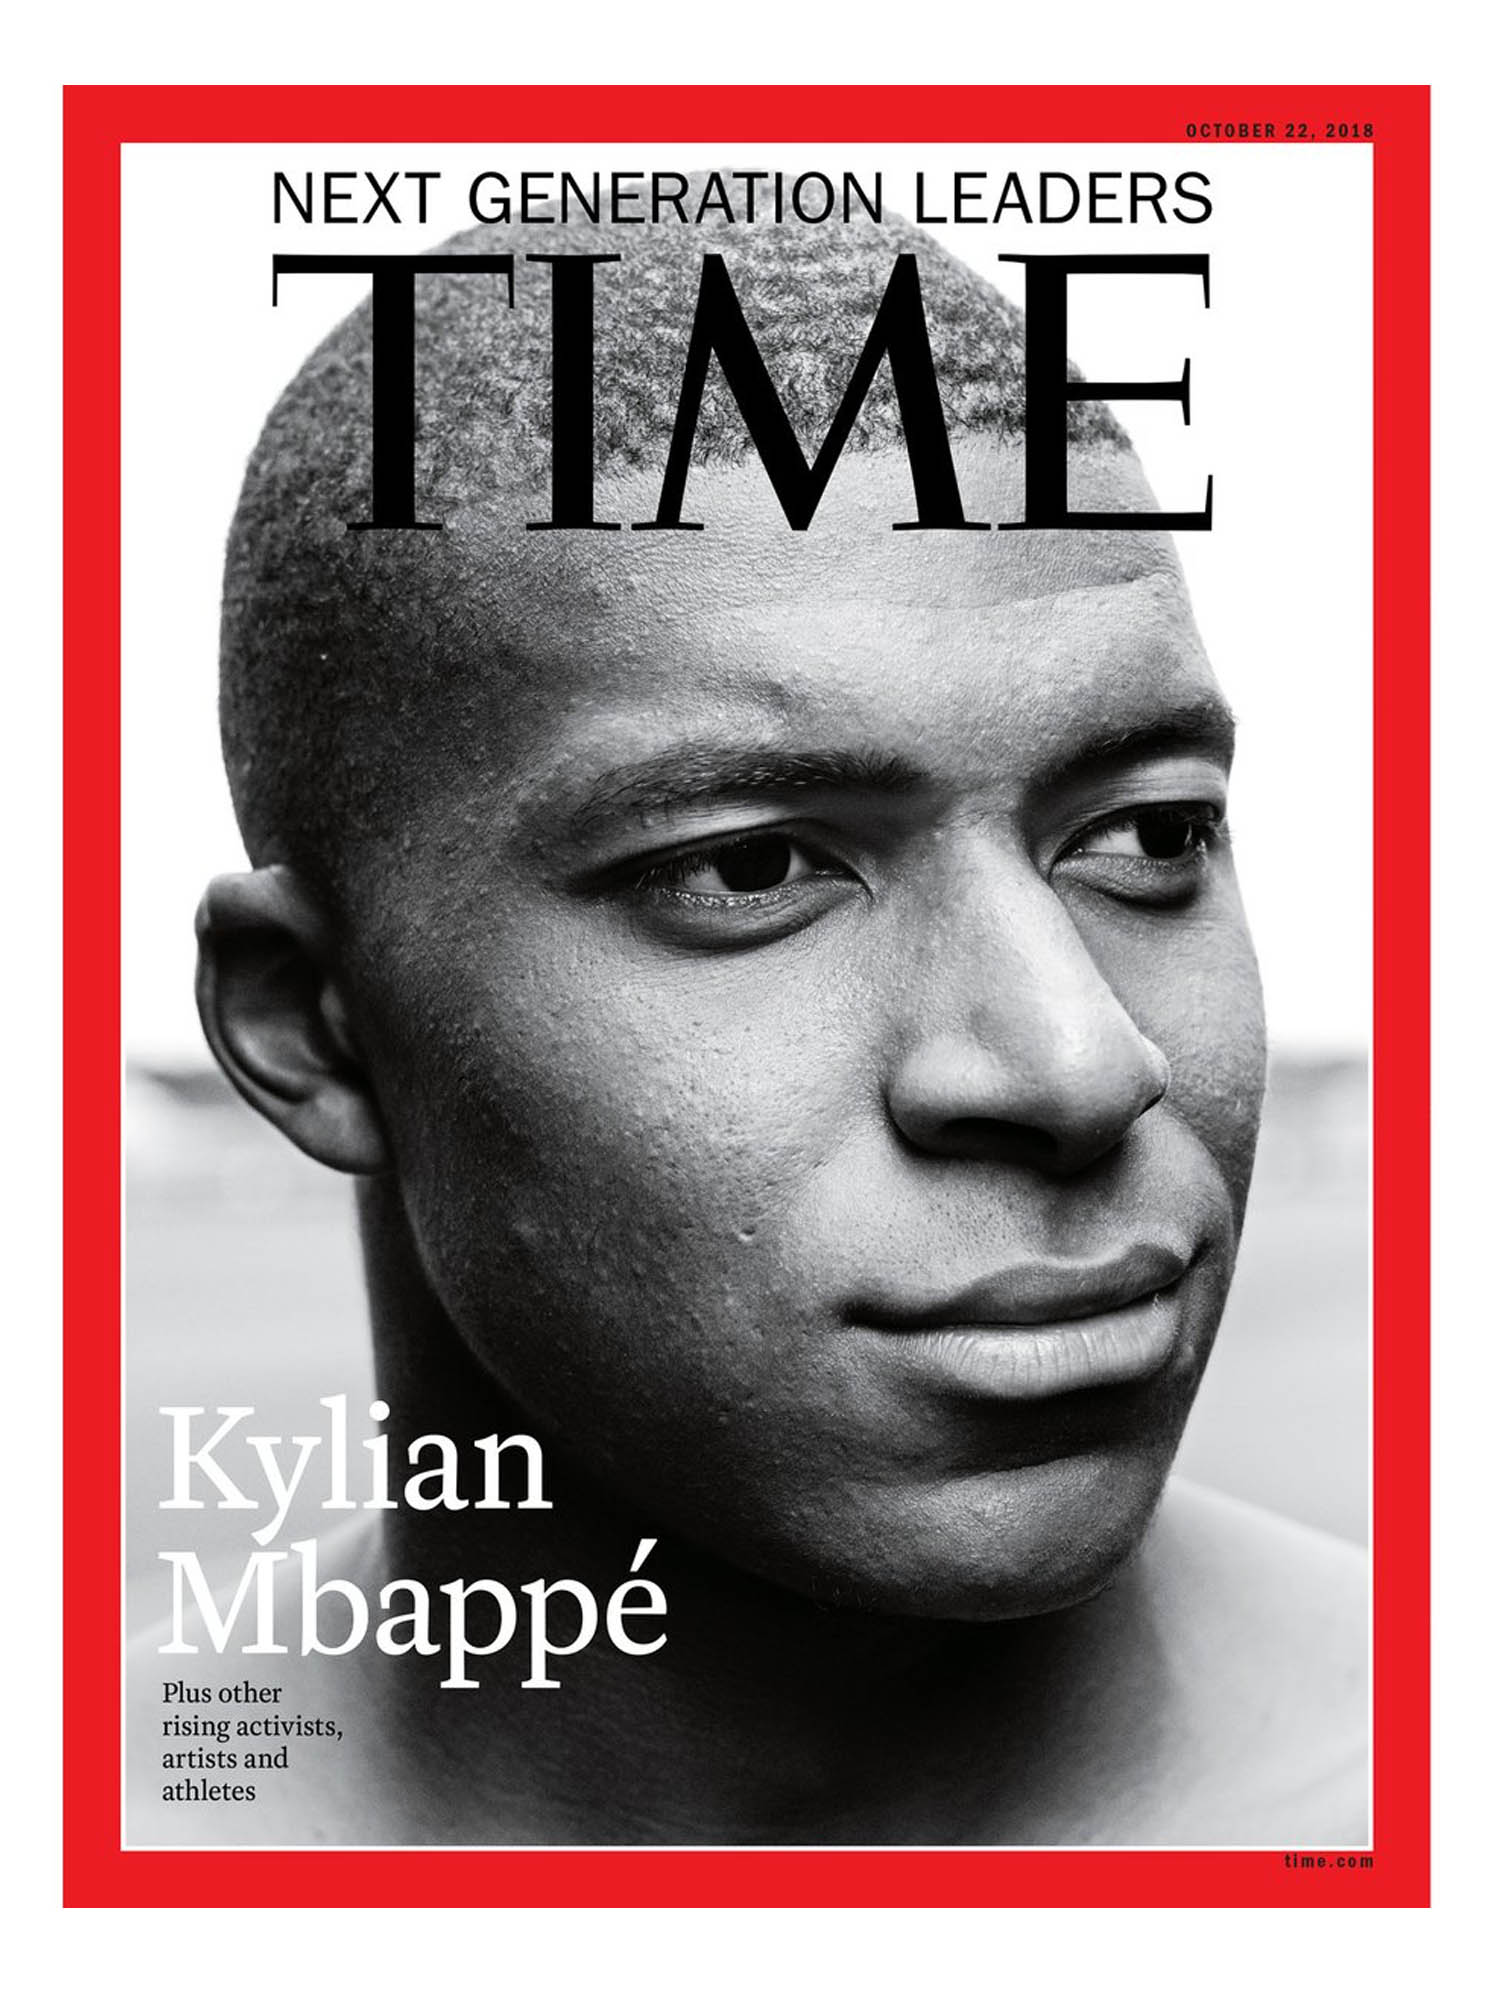 mbappe time magazine portrait.jpg